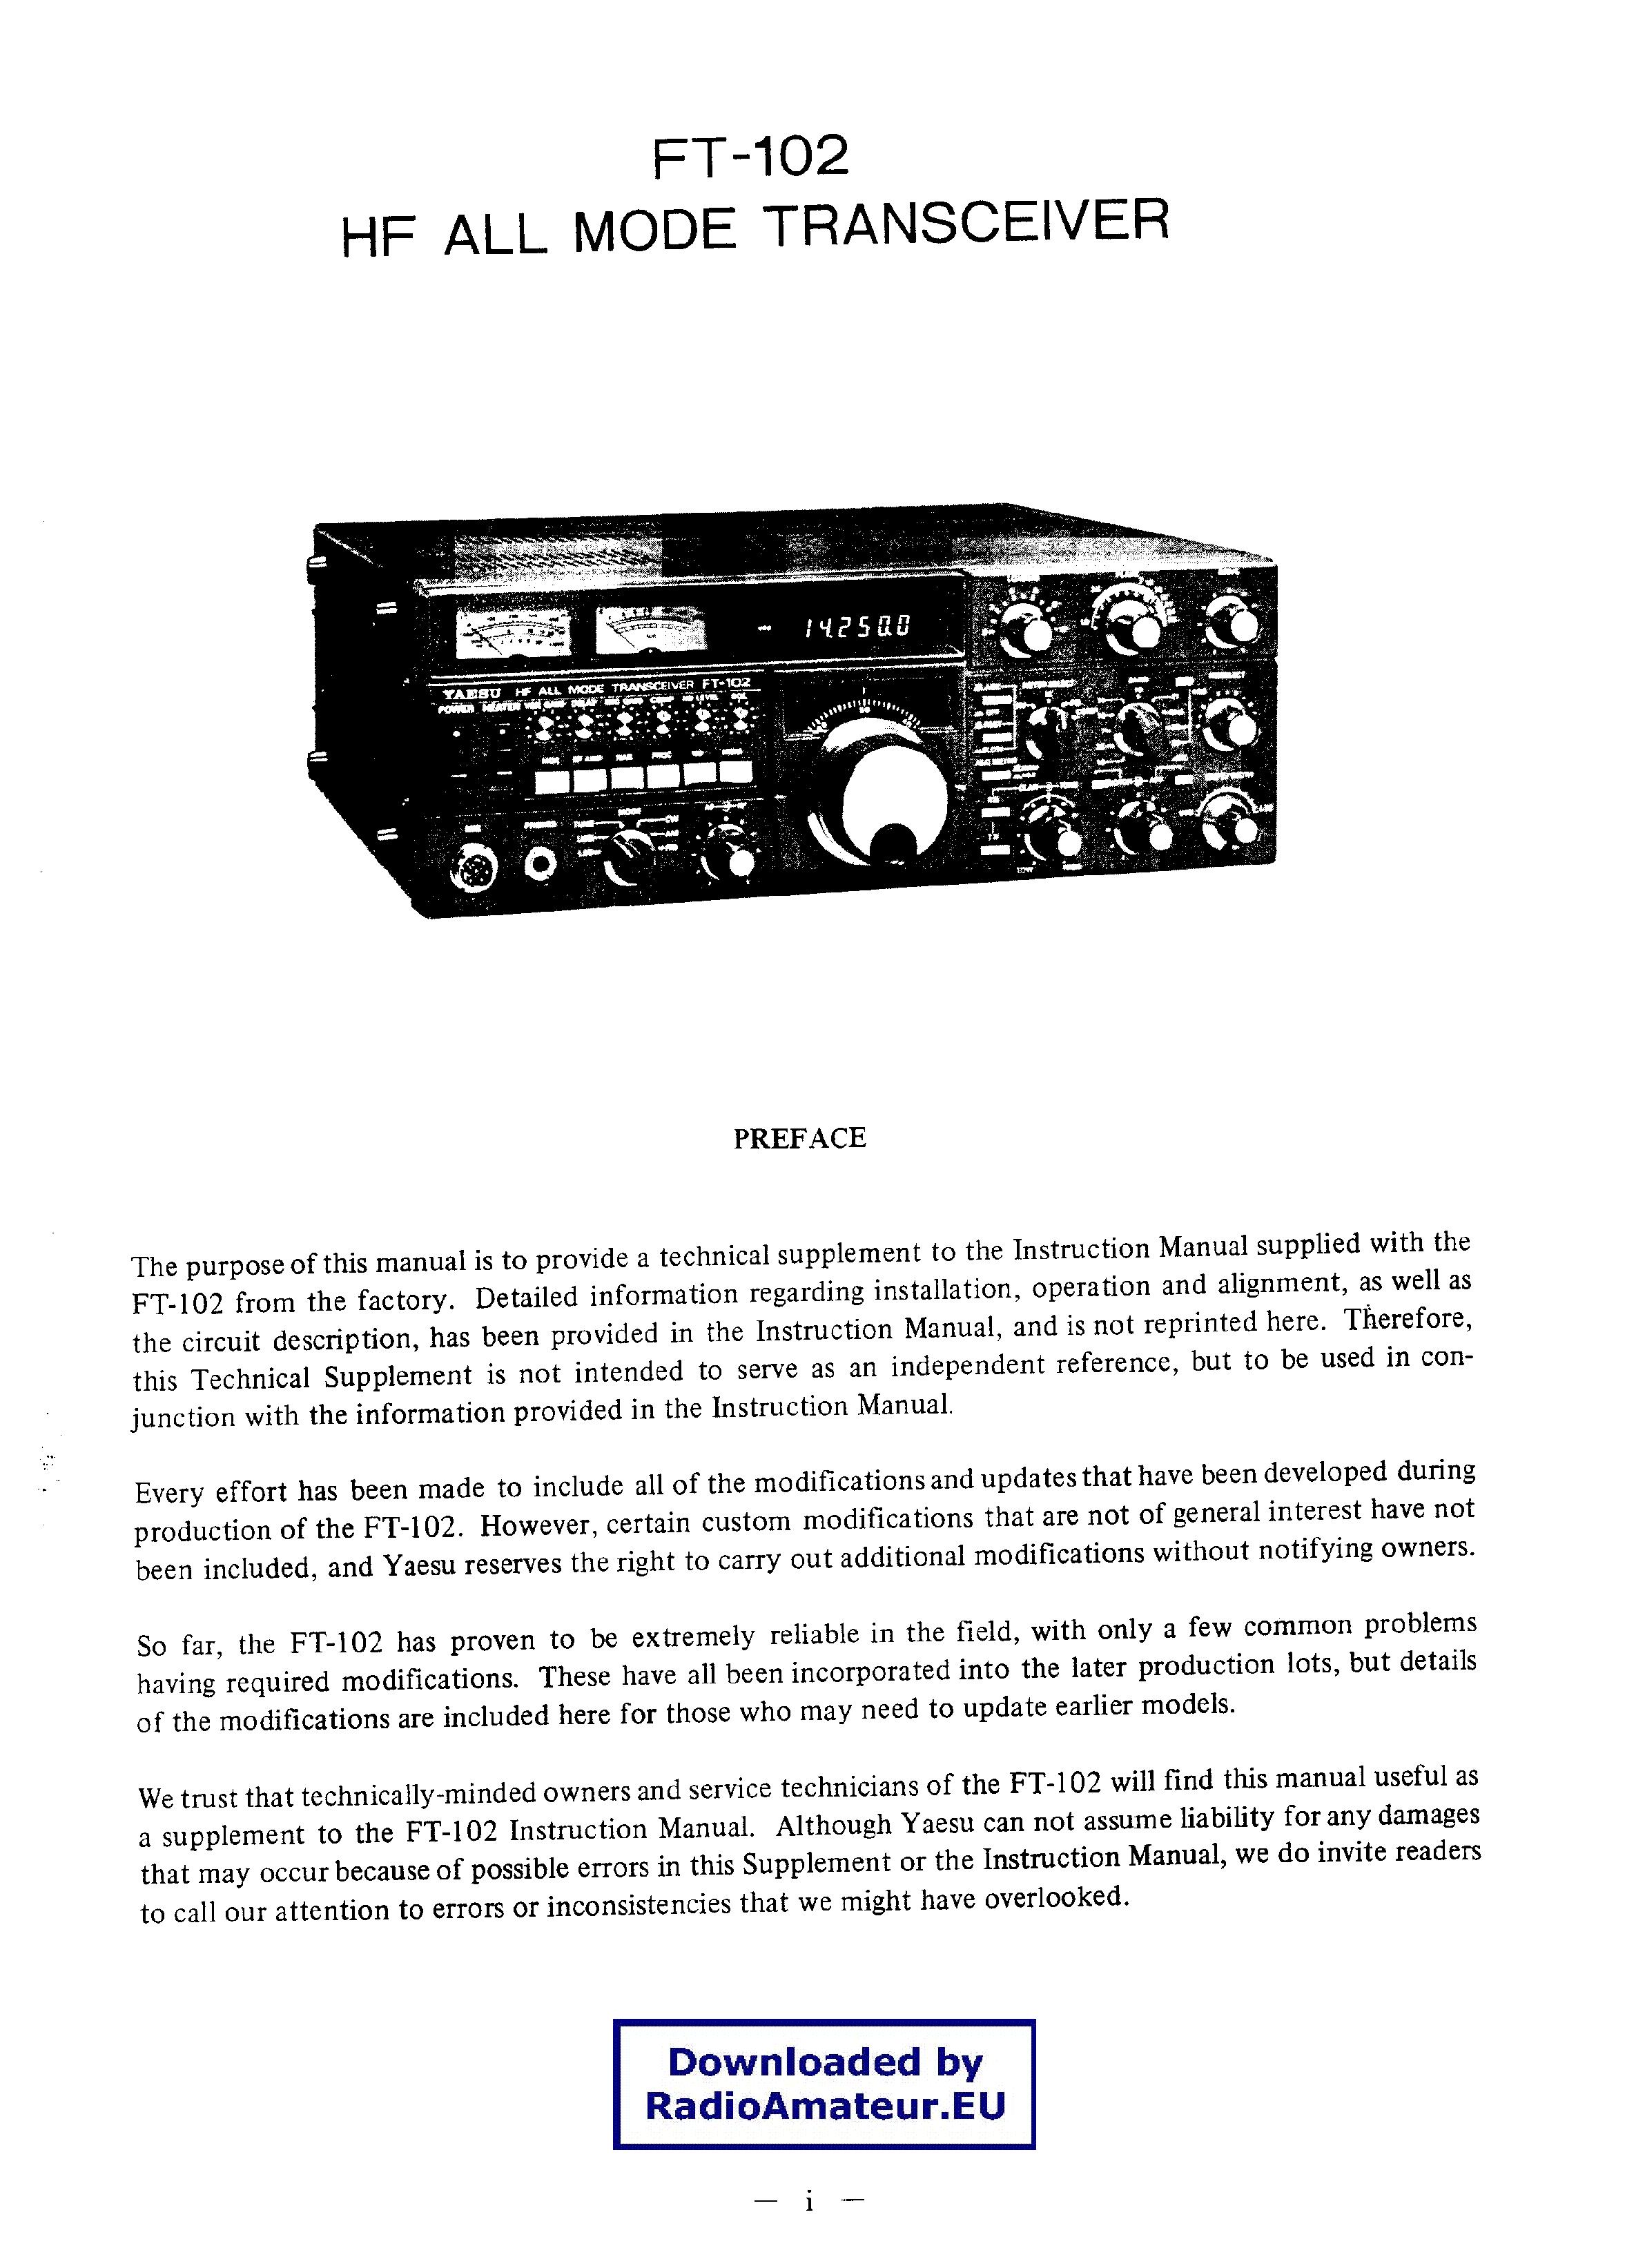 YAESU FT-102 SM 2 service manual (1st page)